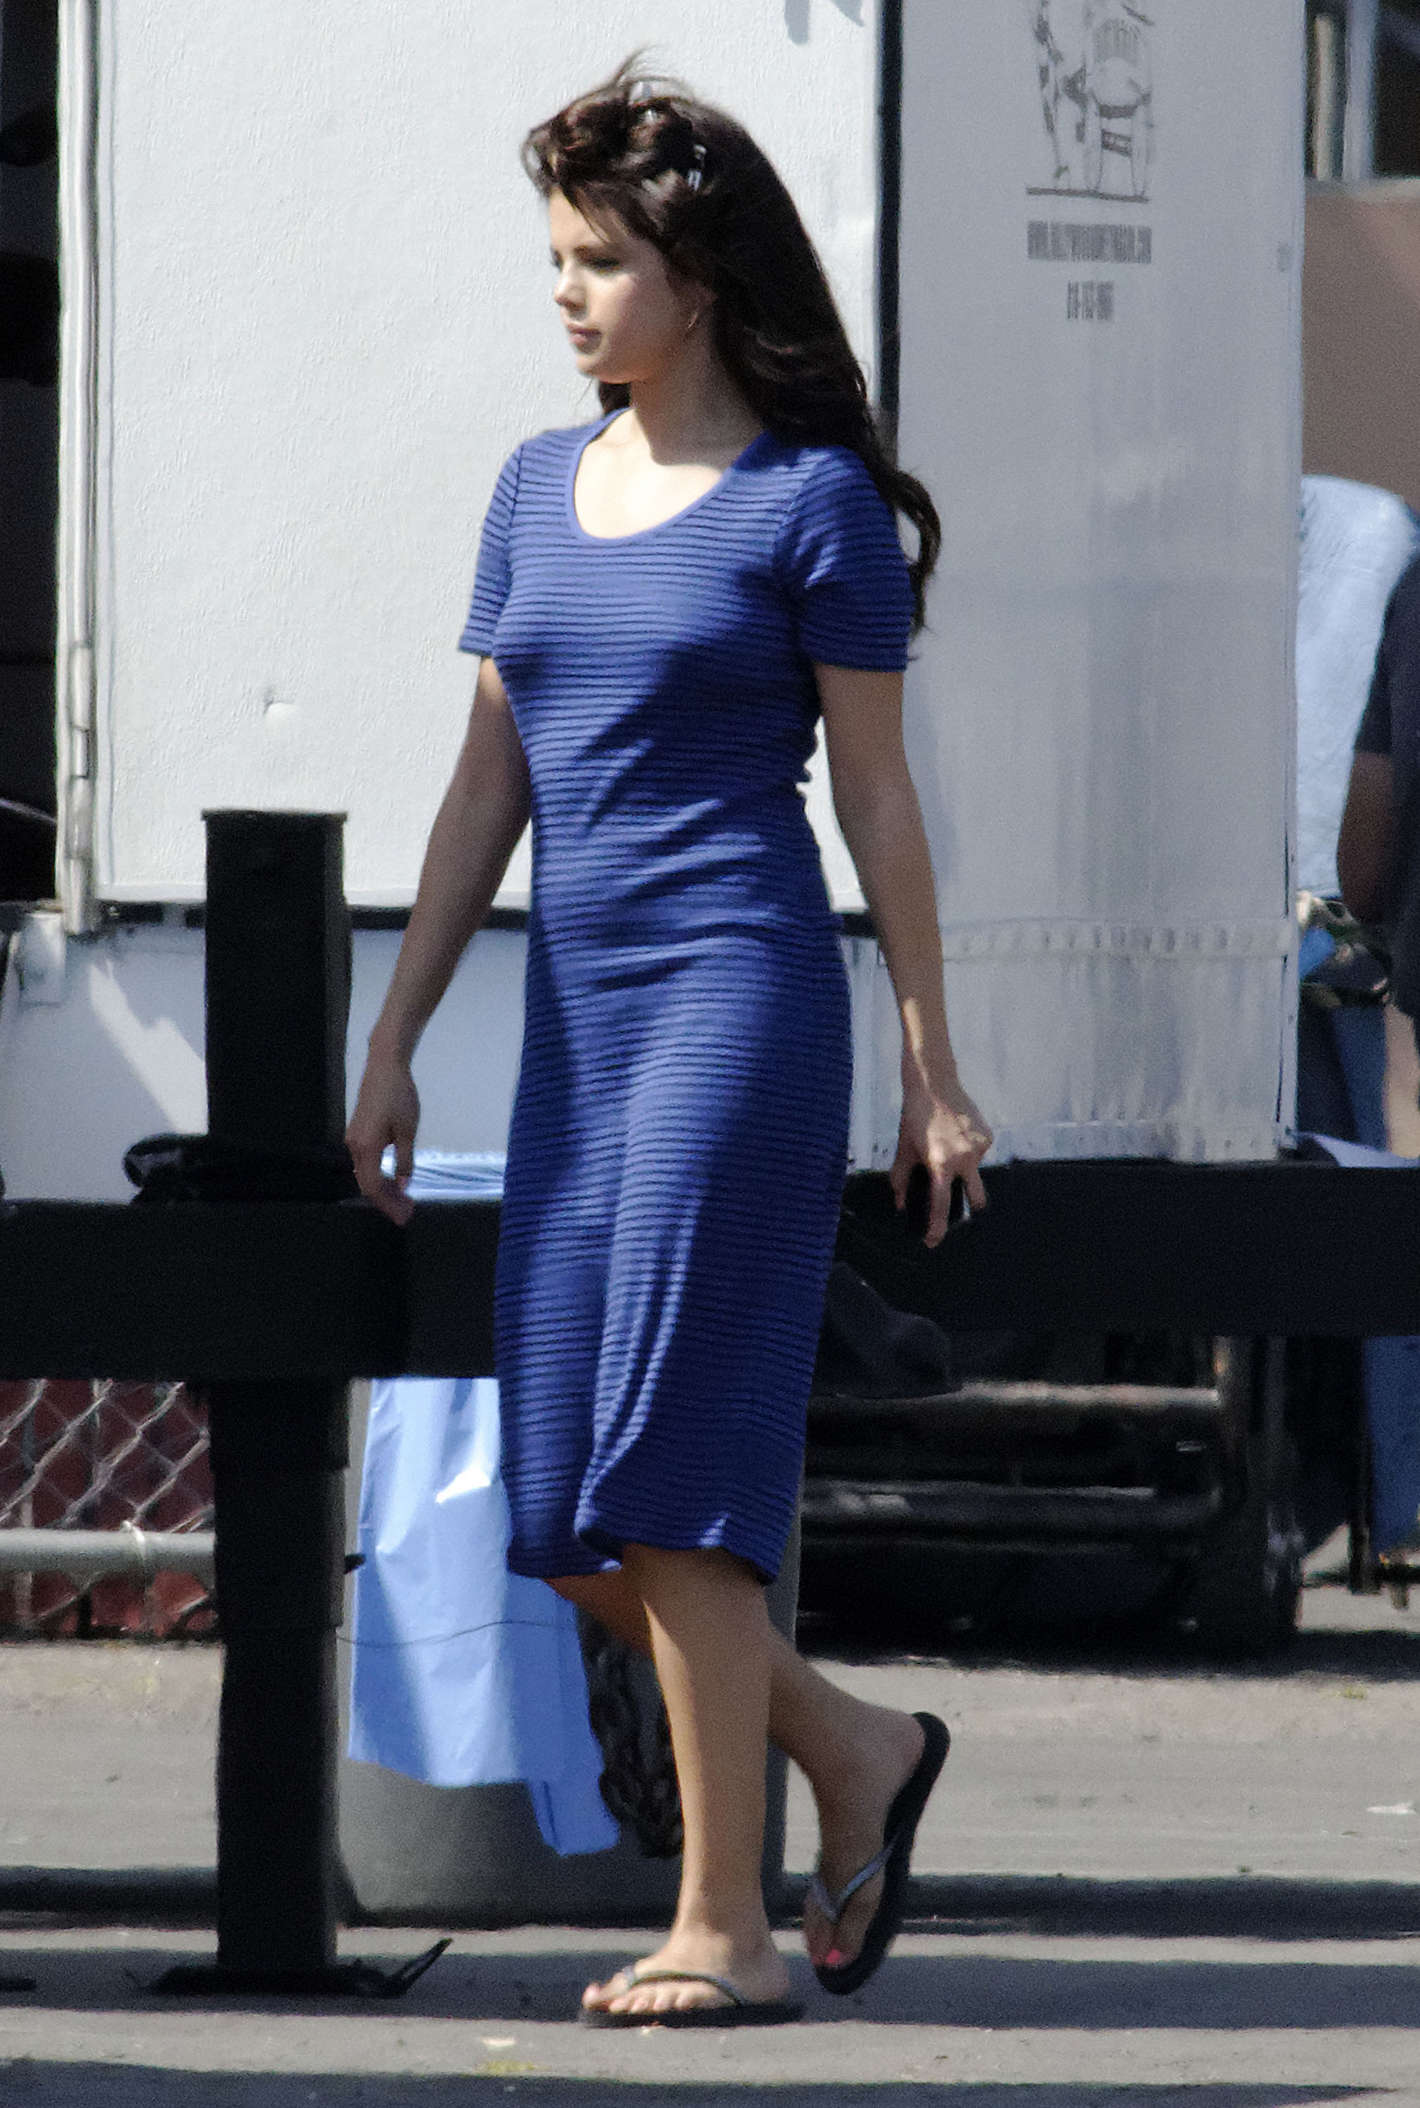 Selena Gomez In Blue Dress On Set Parental Guidance Suggested 04 Gotceleb